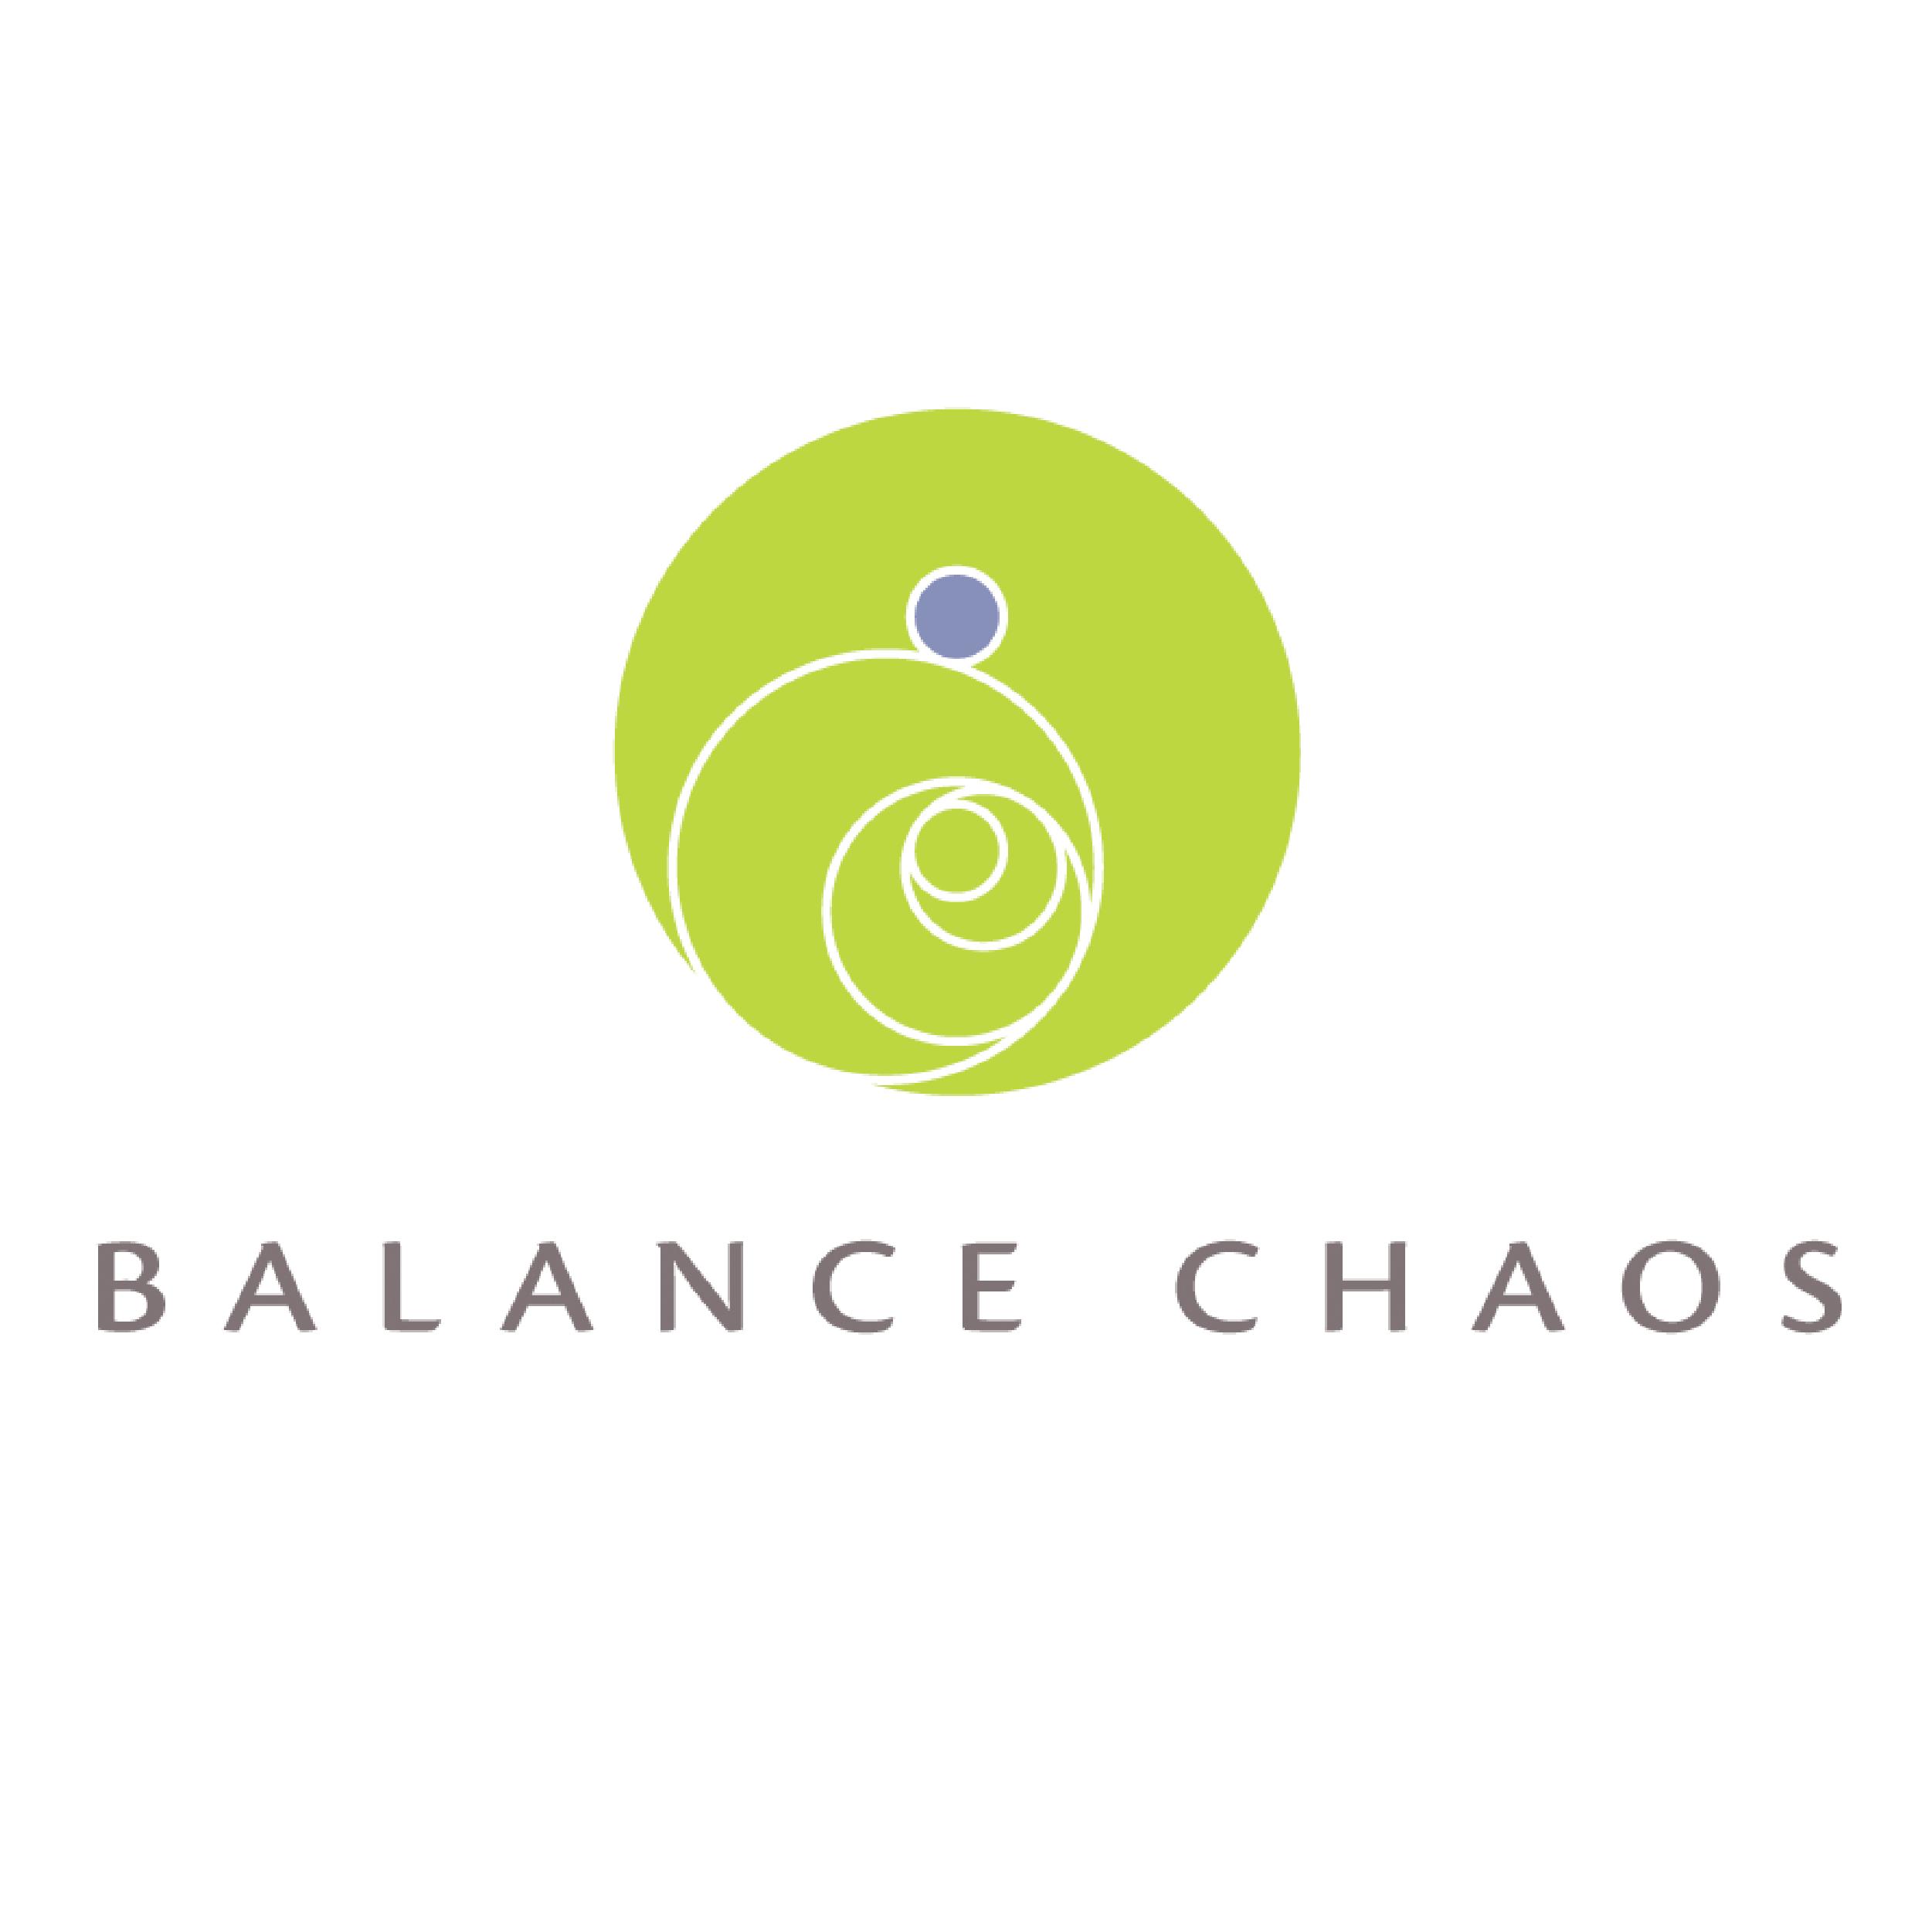 Balance Chaos